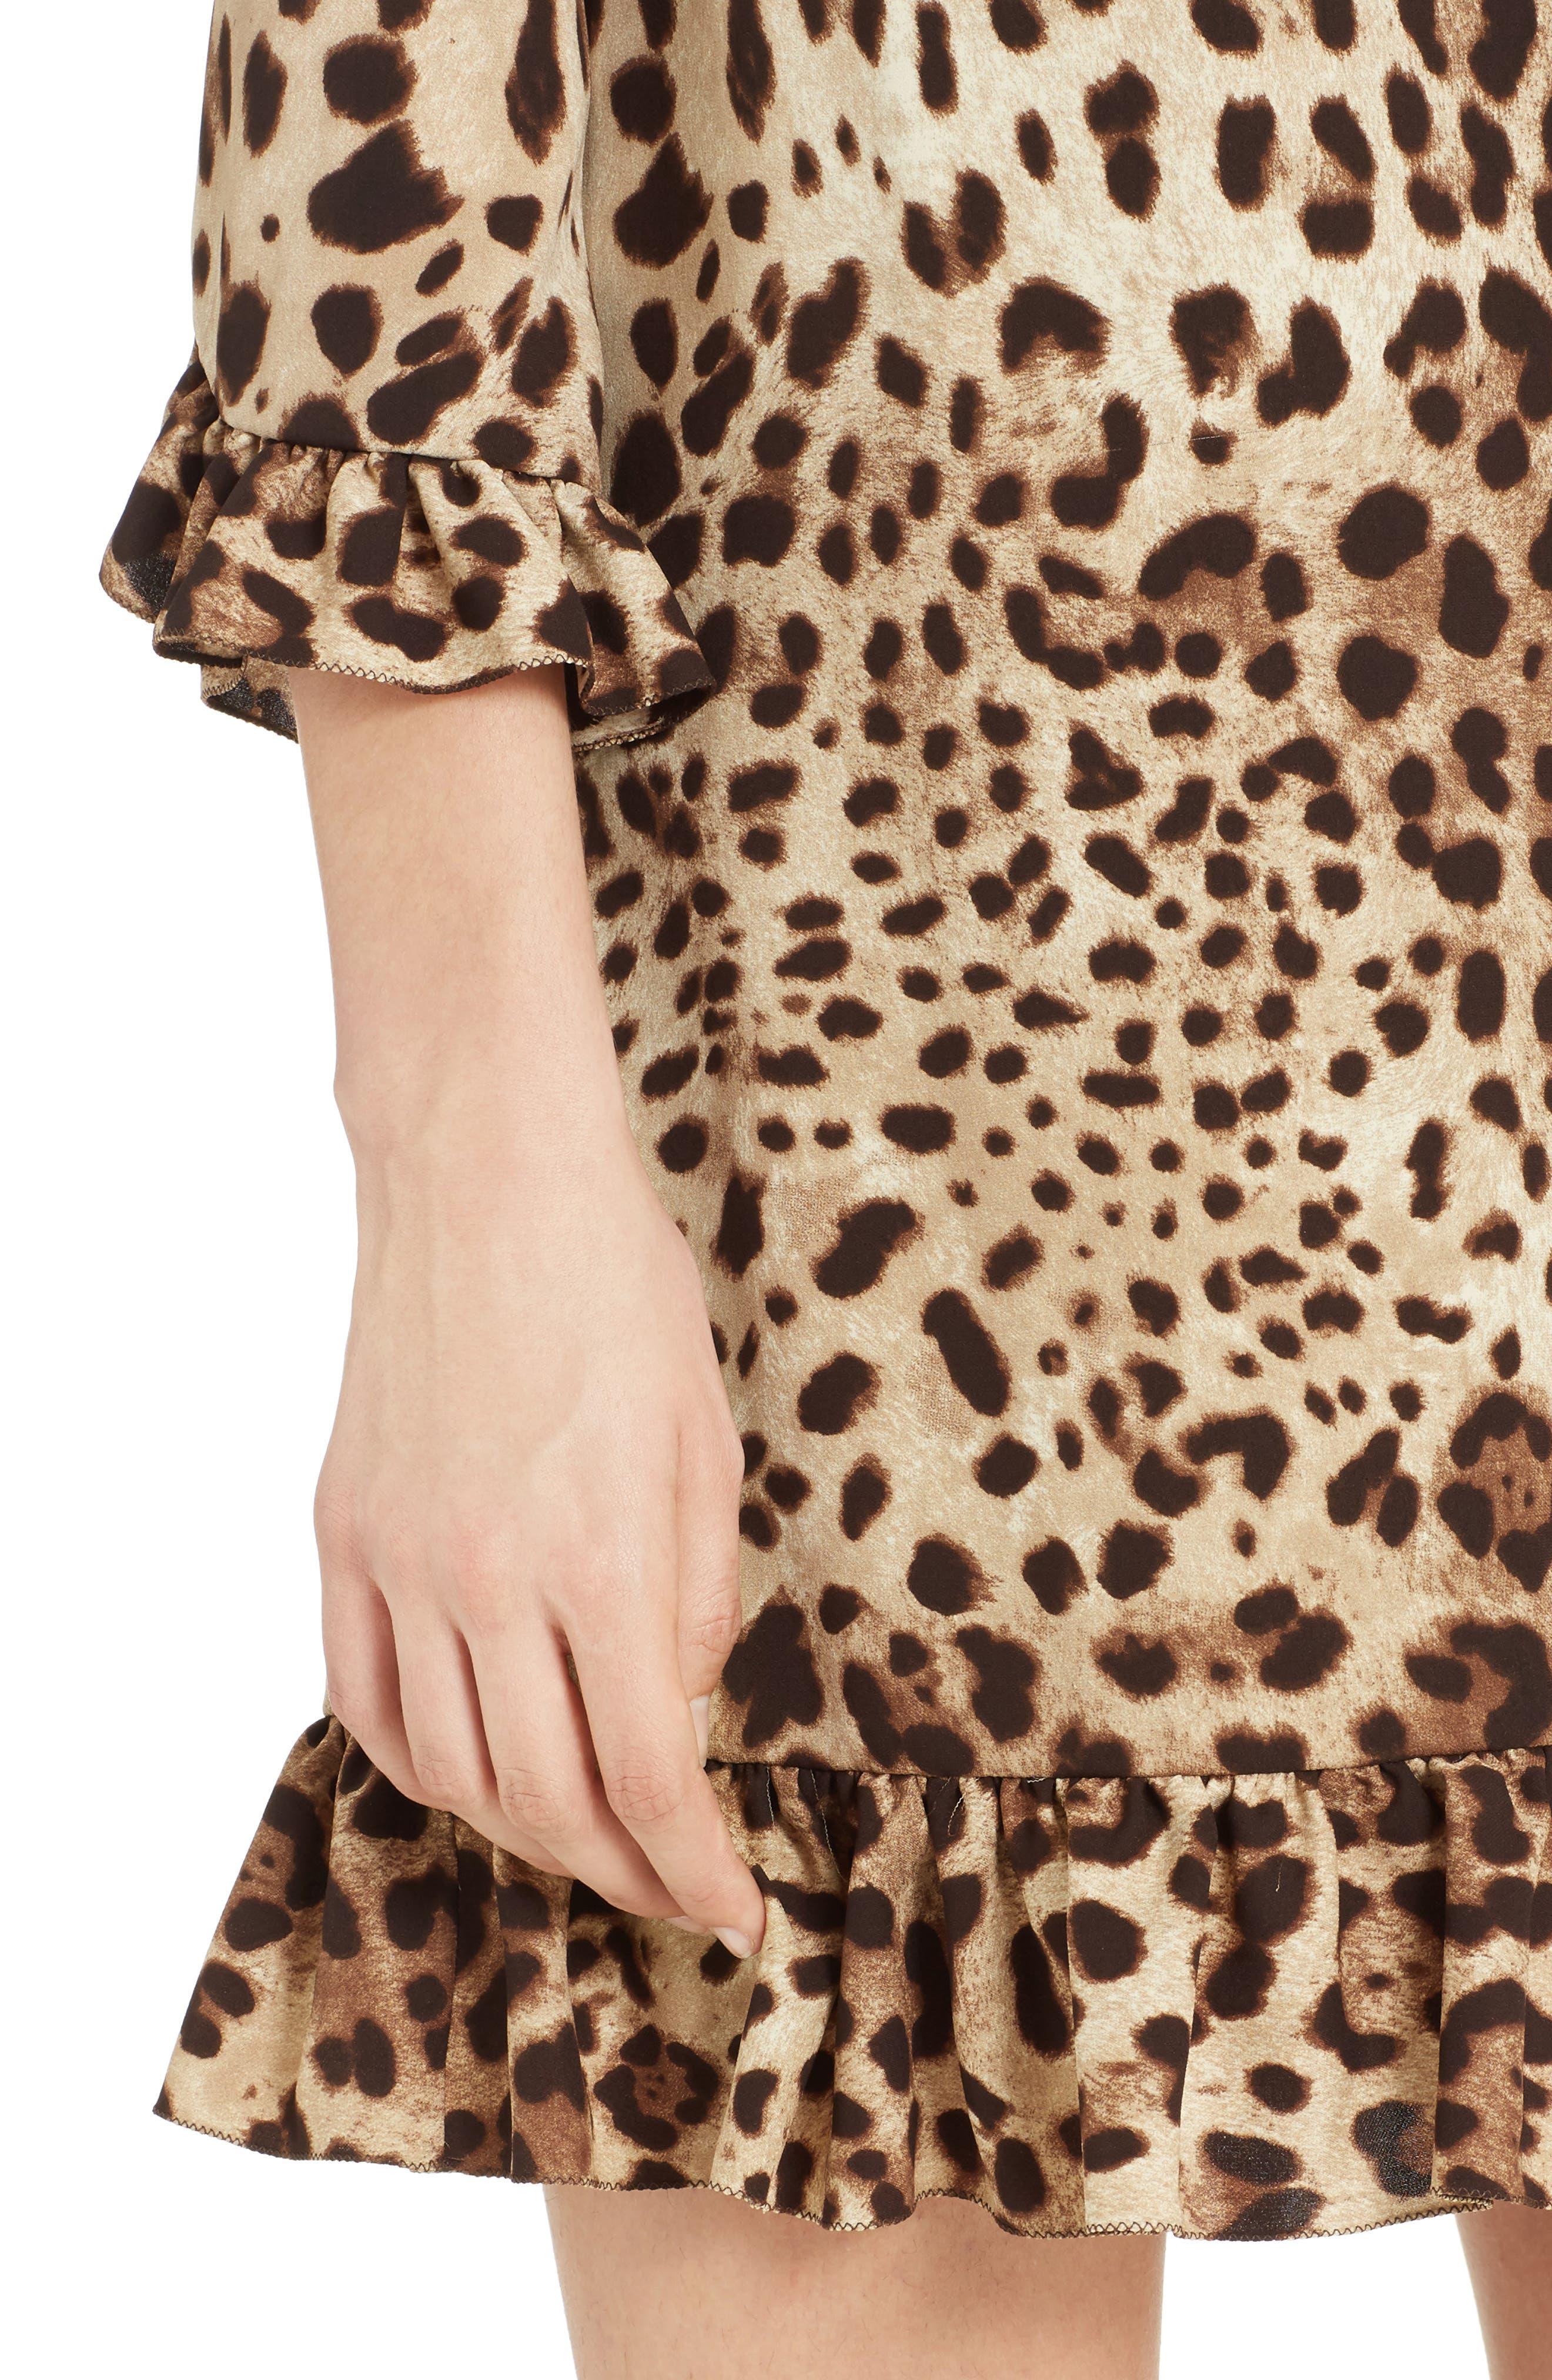 Leopard Print Stretch Silk Dress,                             Alternate thumbnail 4, color,                             Leopard